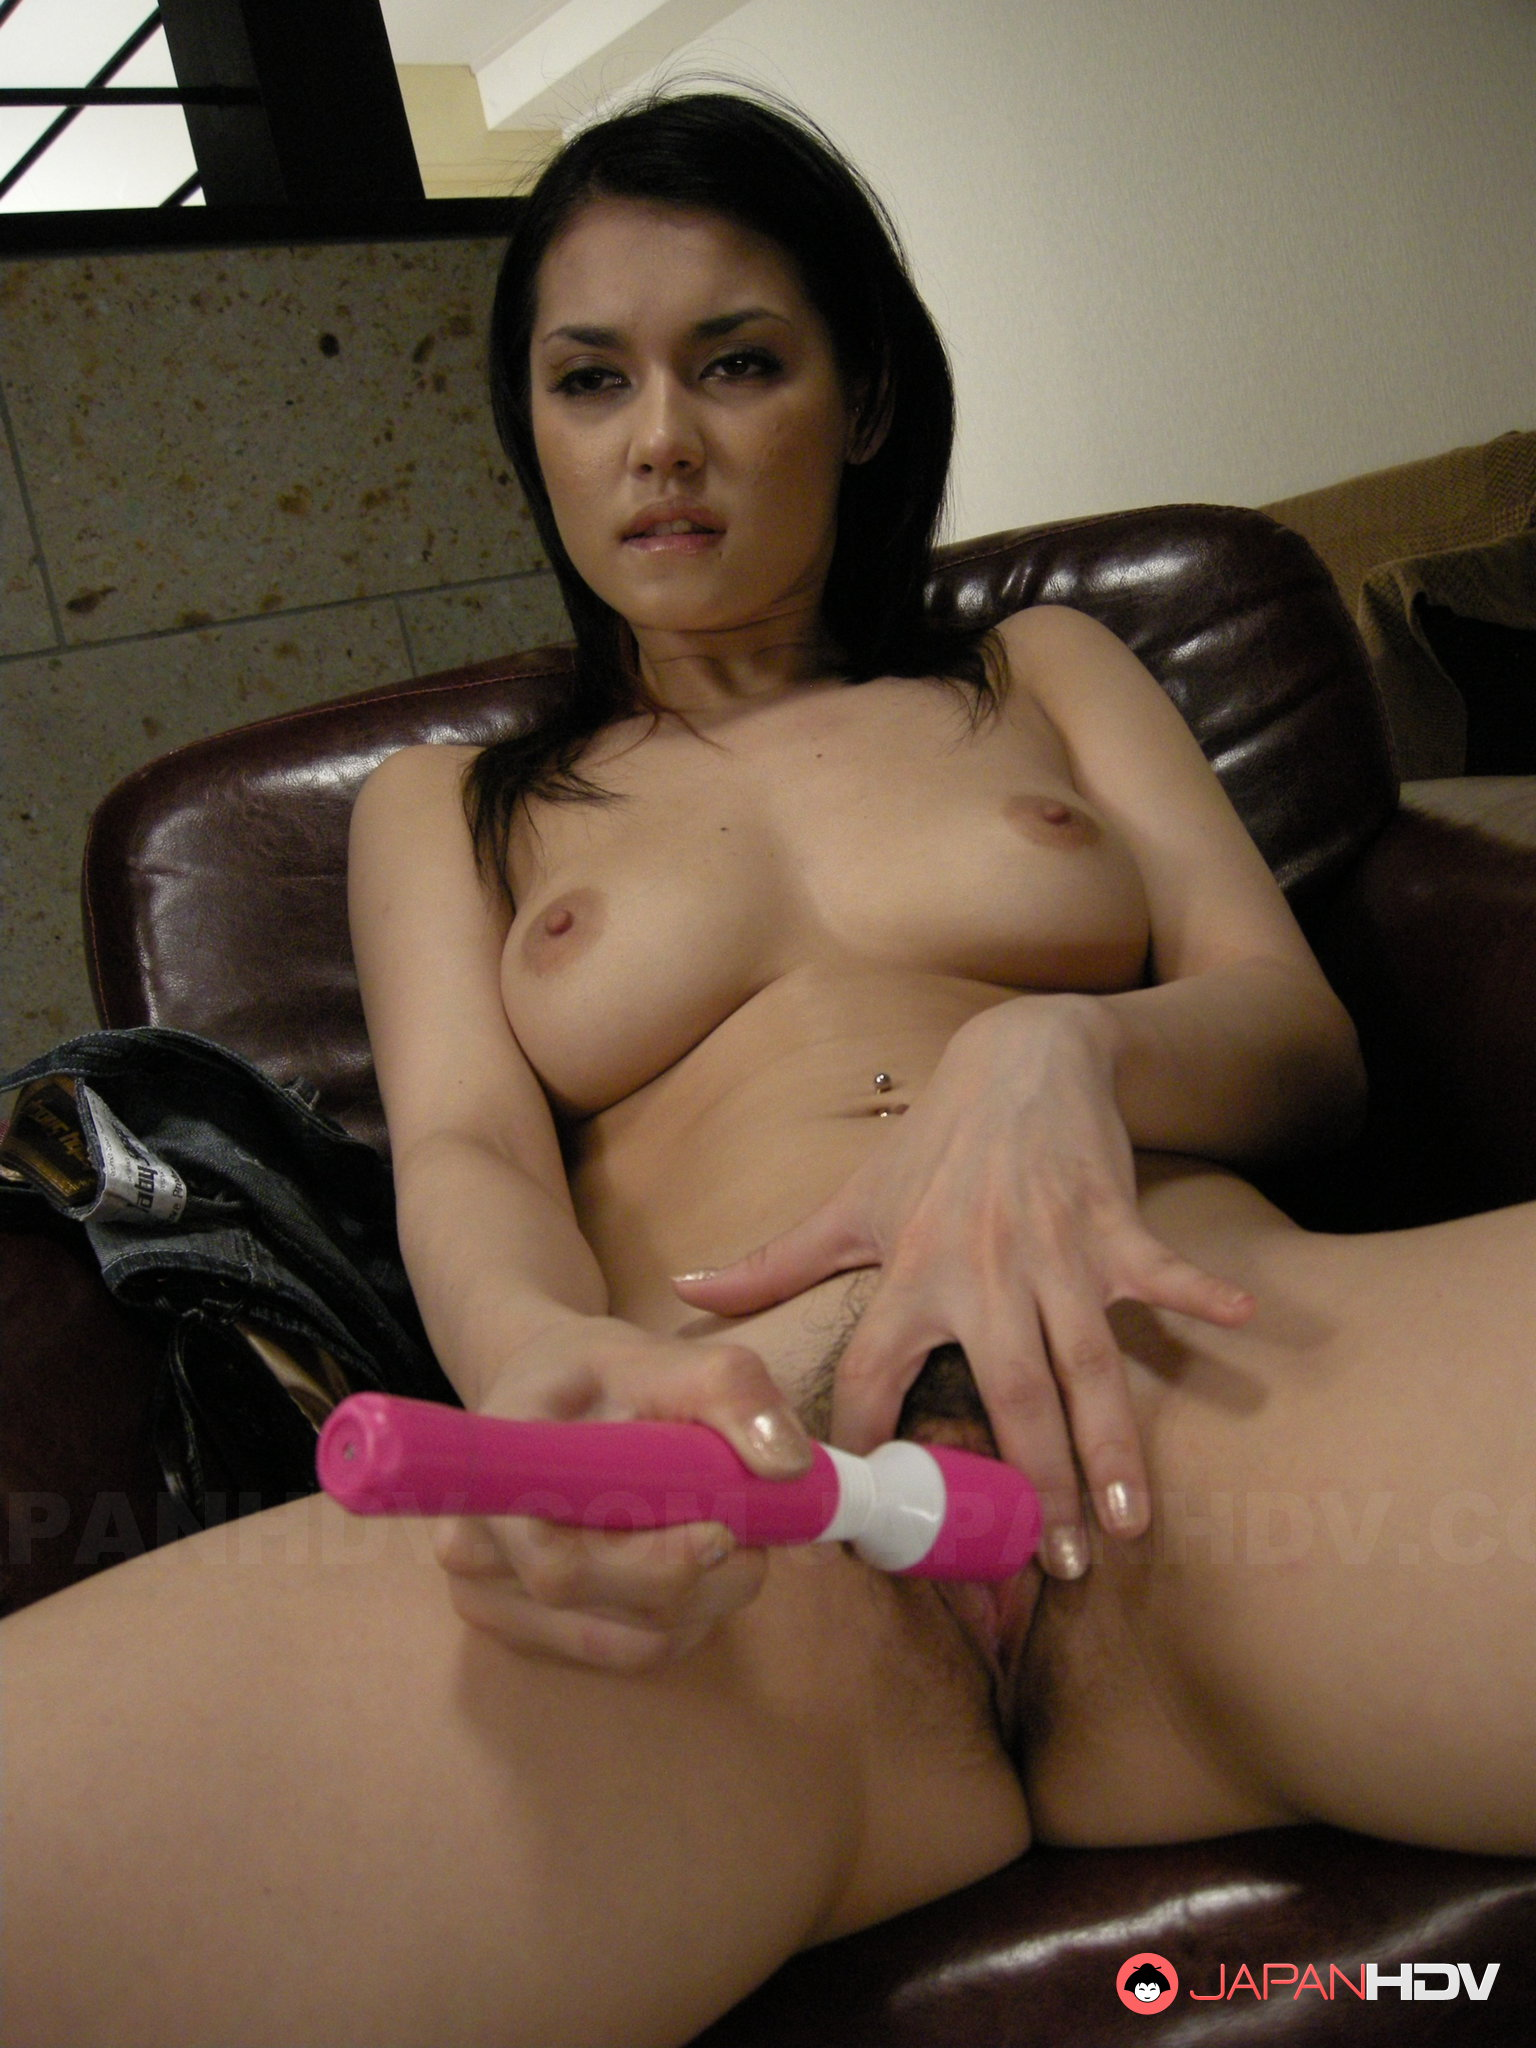 asiatische erotische xxx